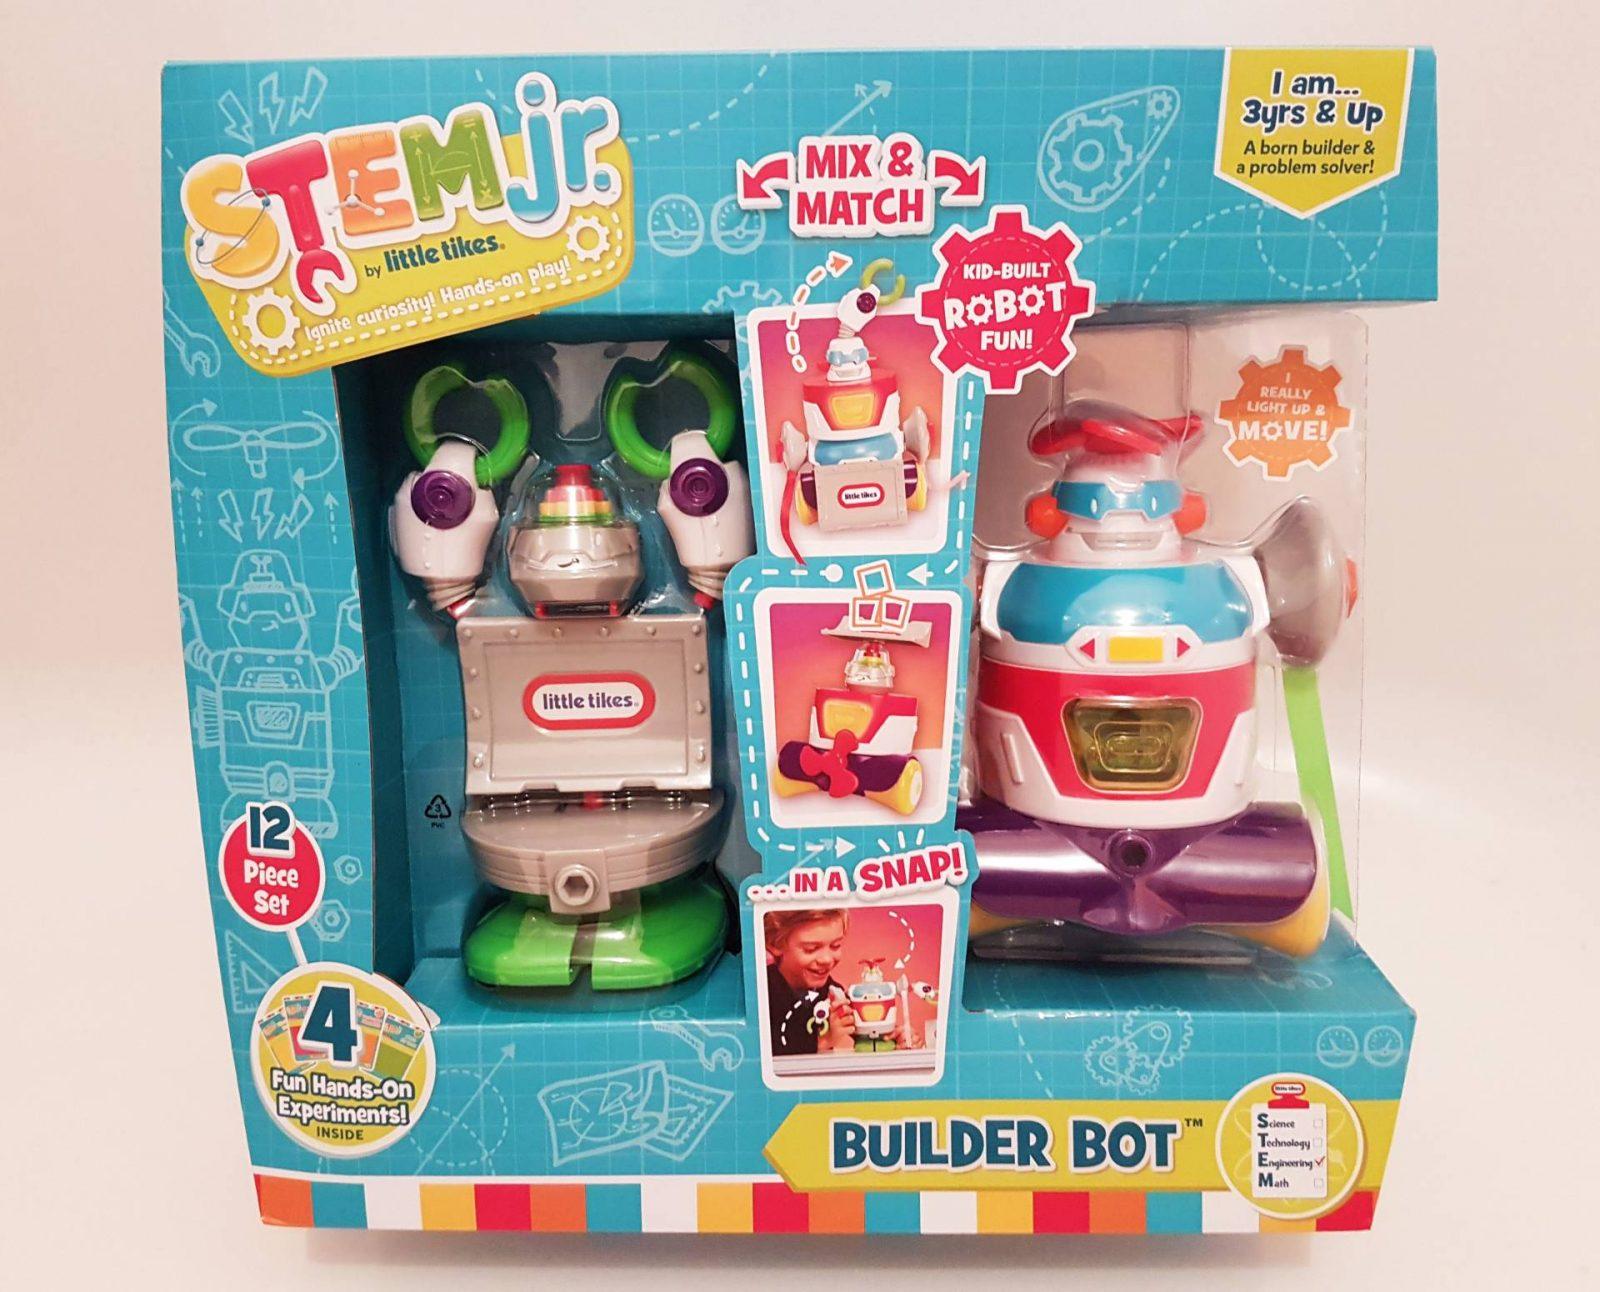 Little Tikes STEM Jr Builder Bot Review